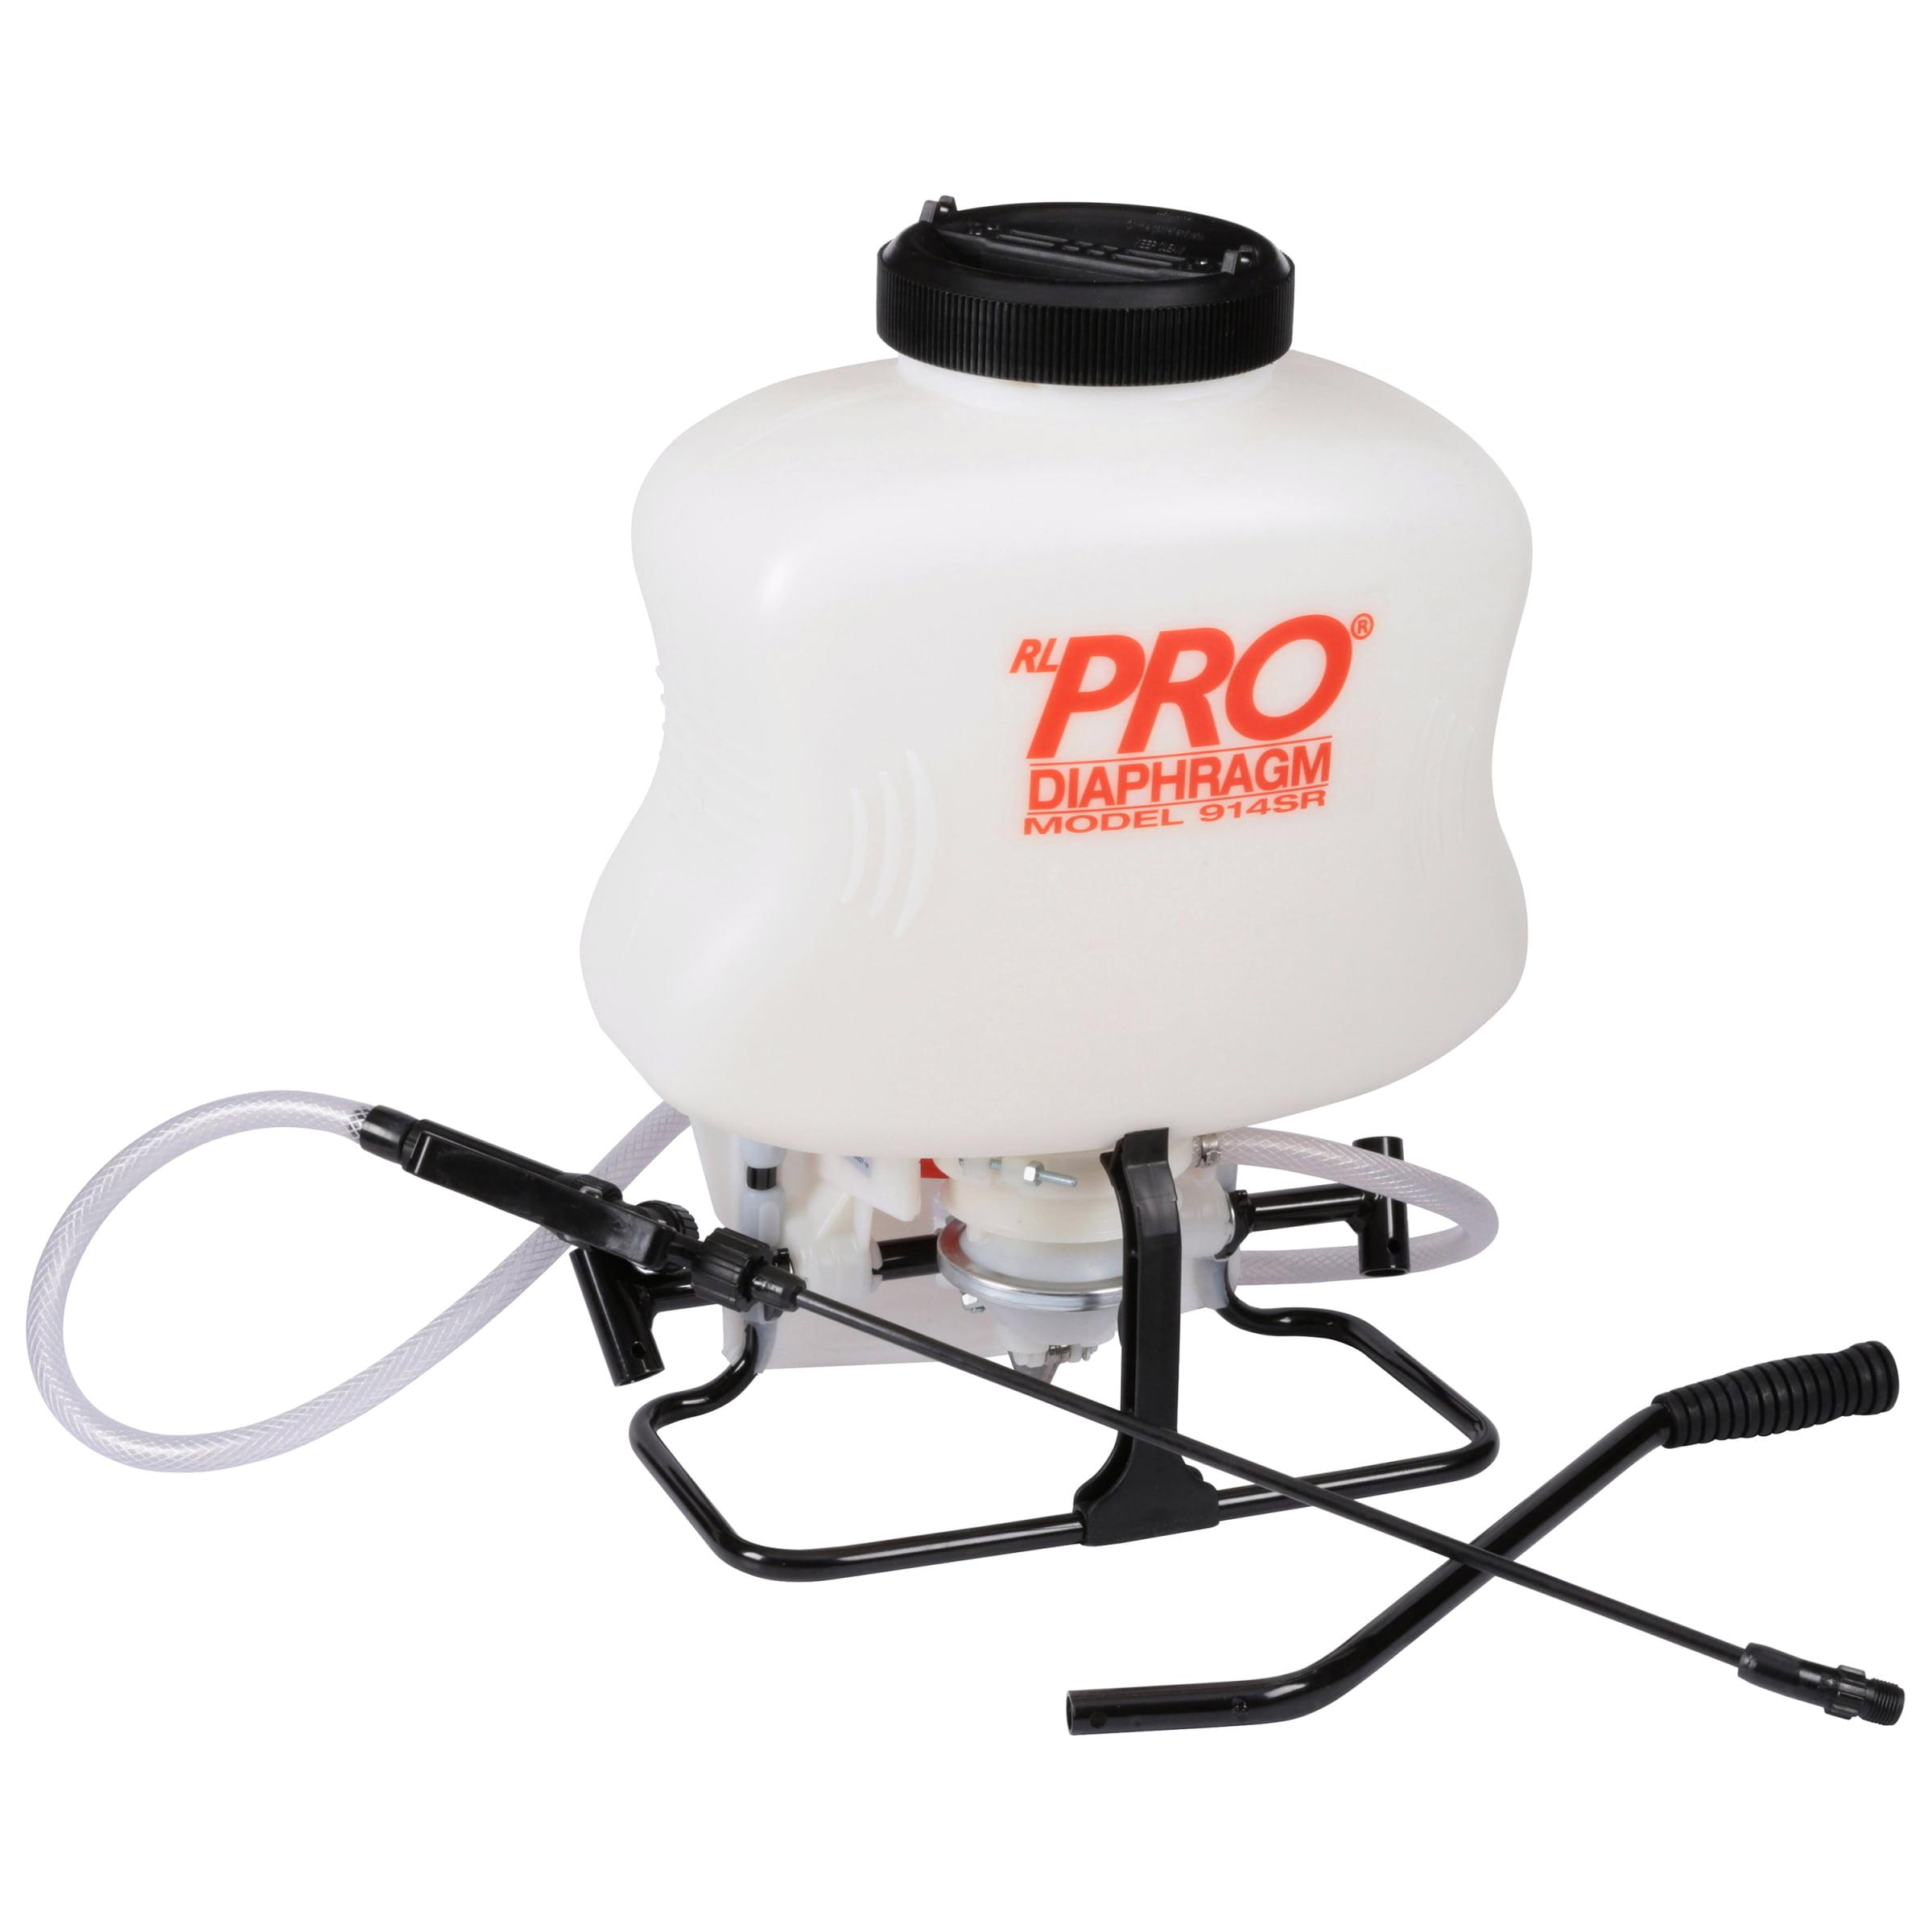 RL Pro® 4 Gallon Diaphragm Backpack Sprayer